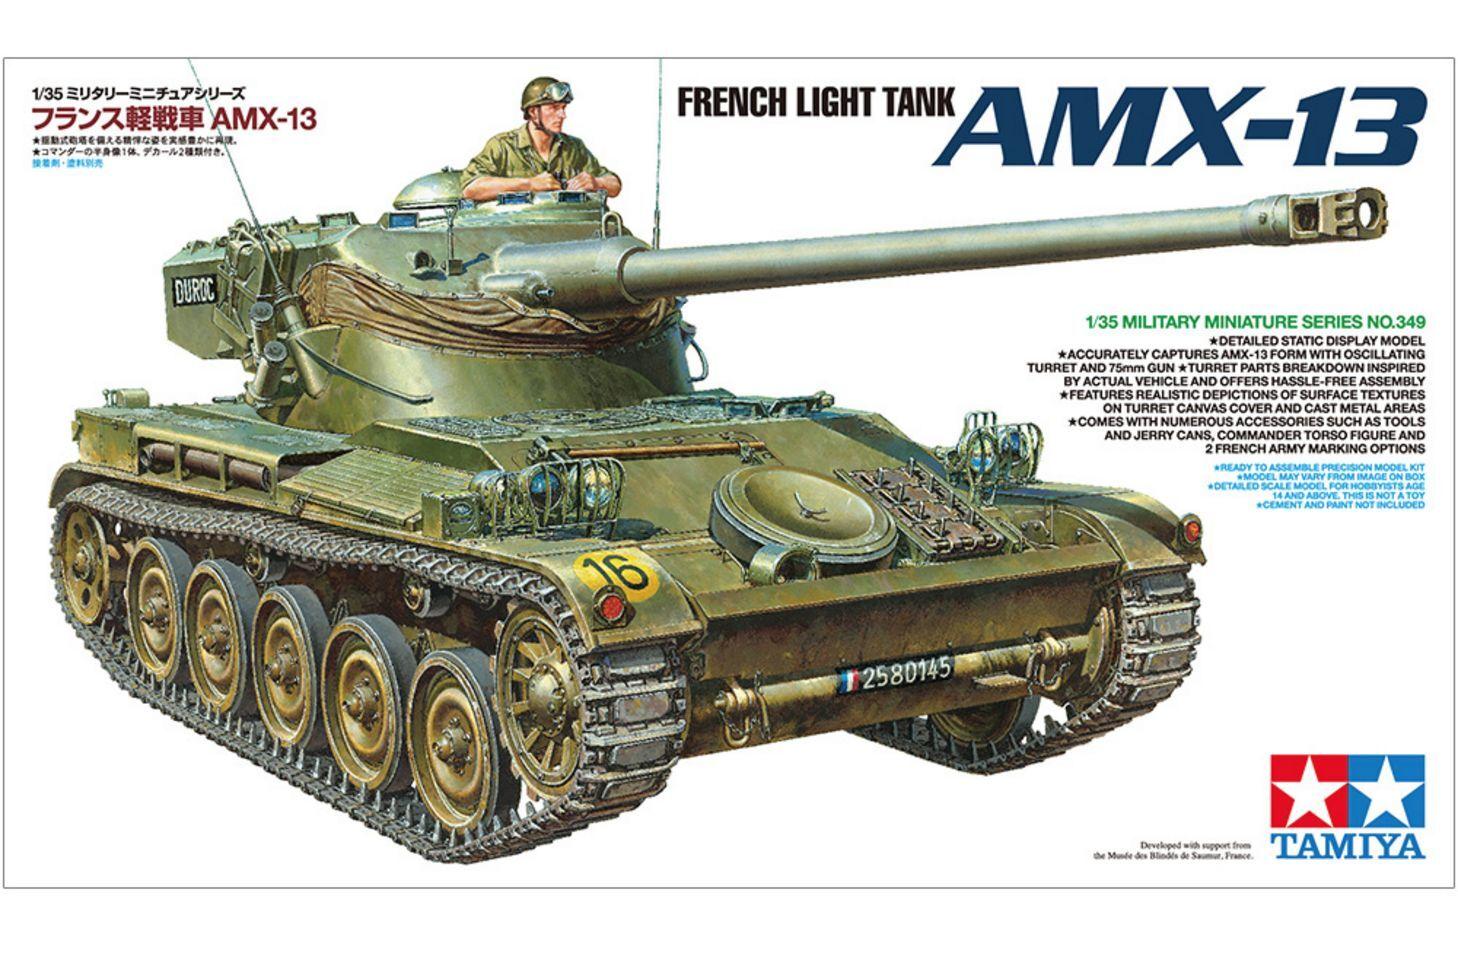 French Light Tank AMX-13 - Tamiya 35349 1 35 Scale kit